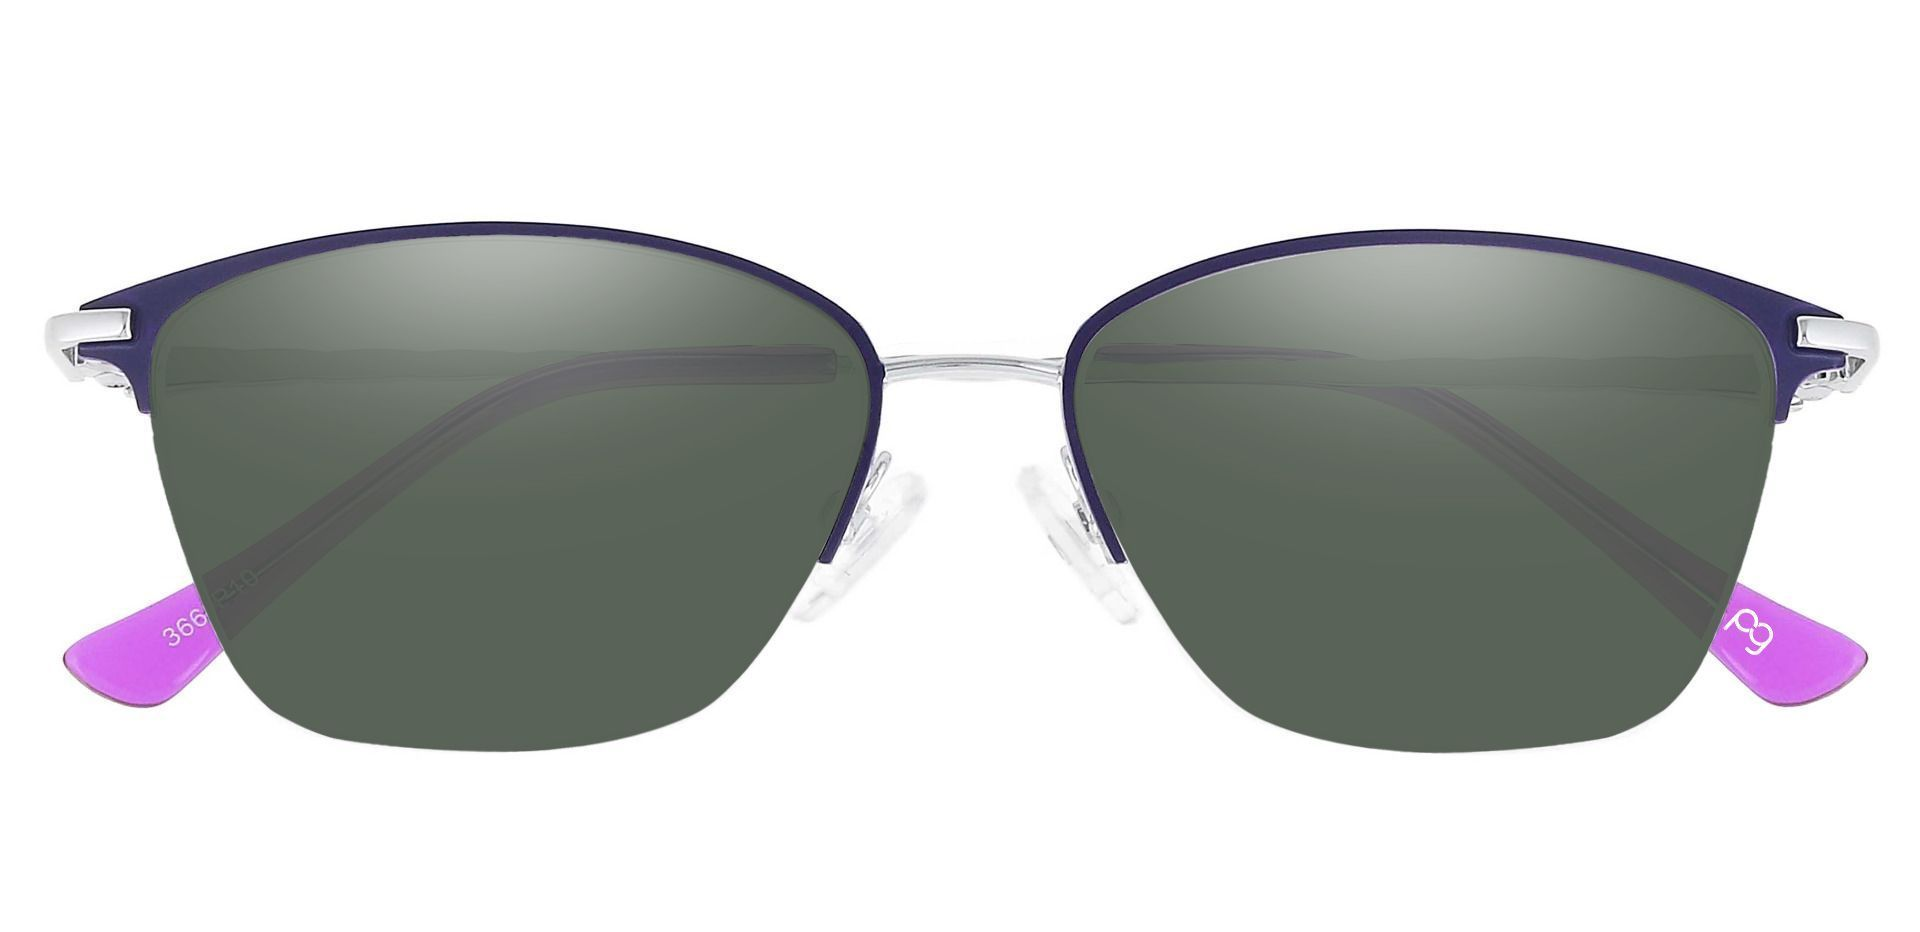 Marigold Rectangle Prescription Sunglasses - Purple Frame With Green Lenses